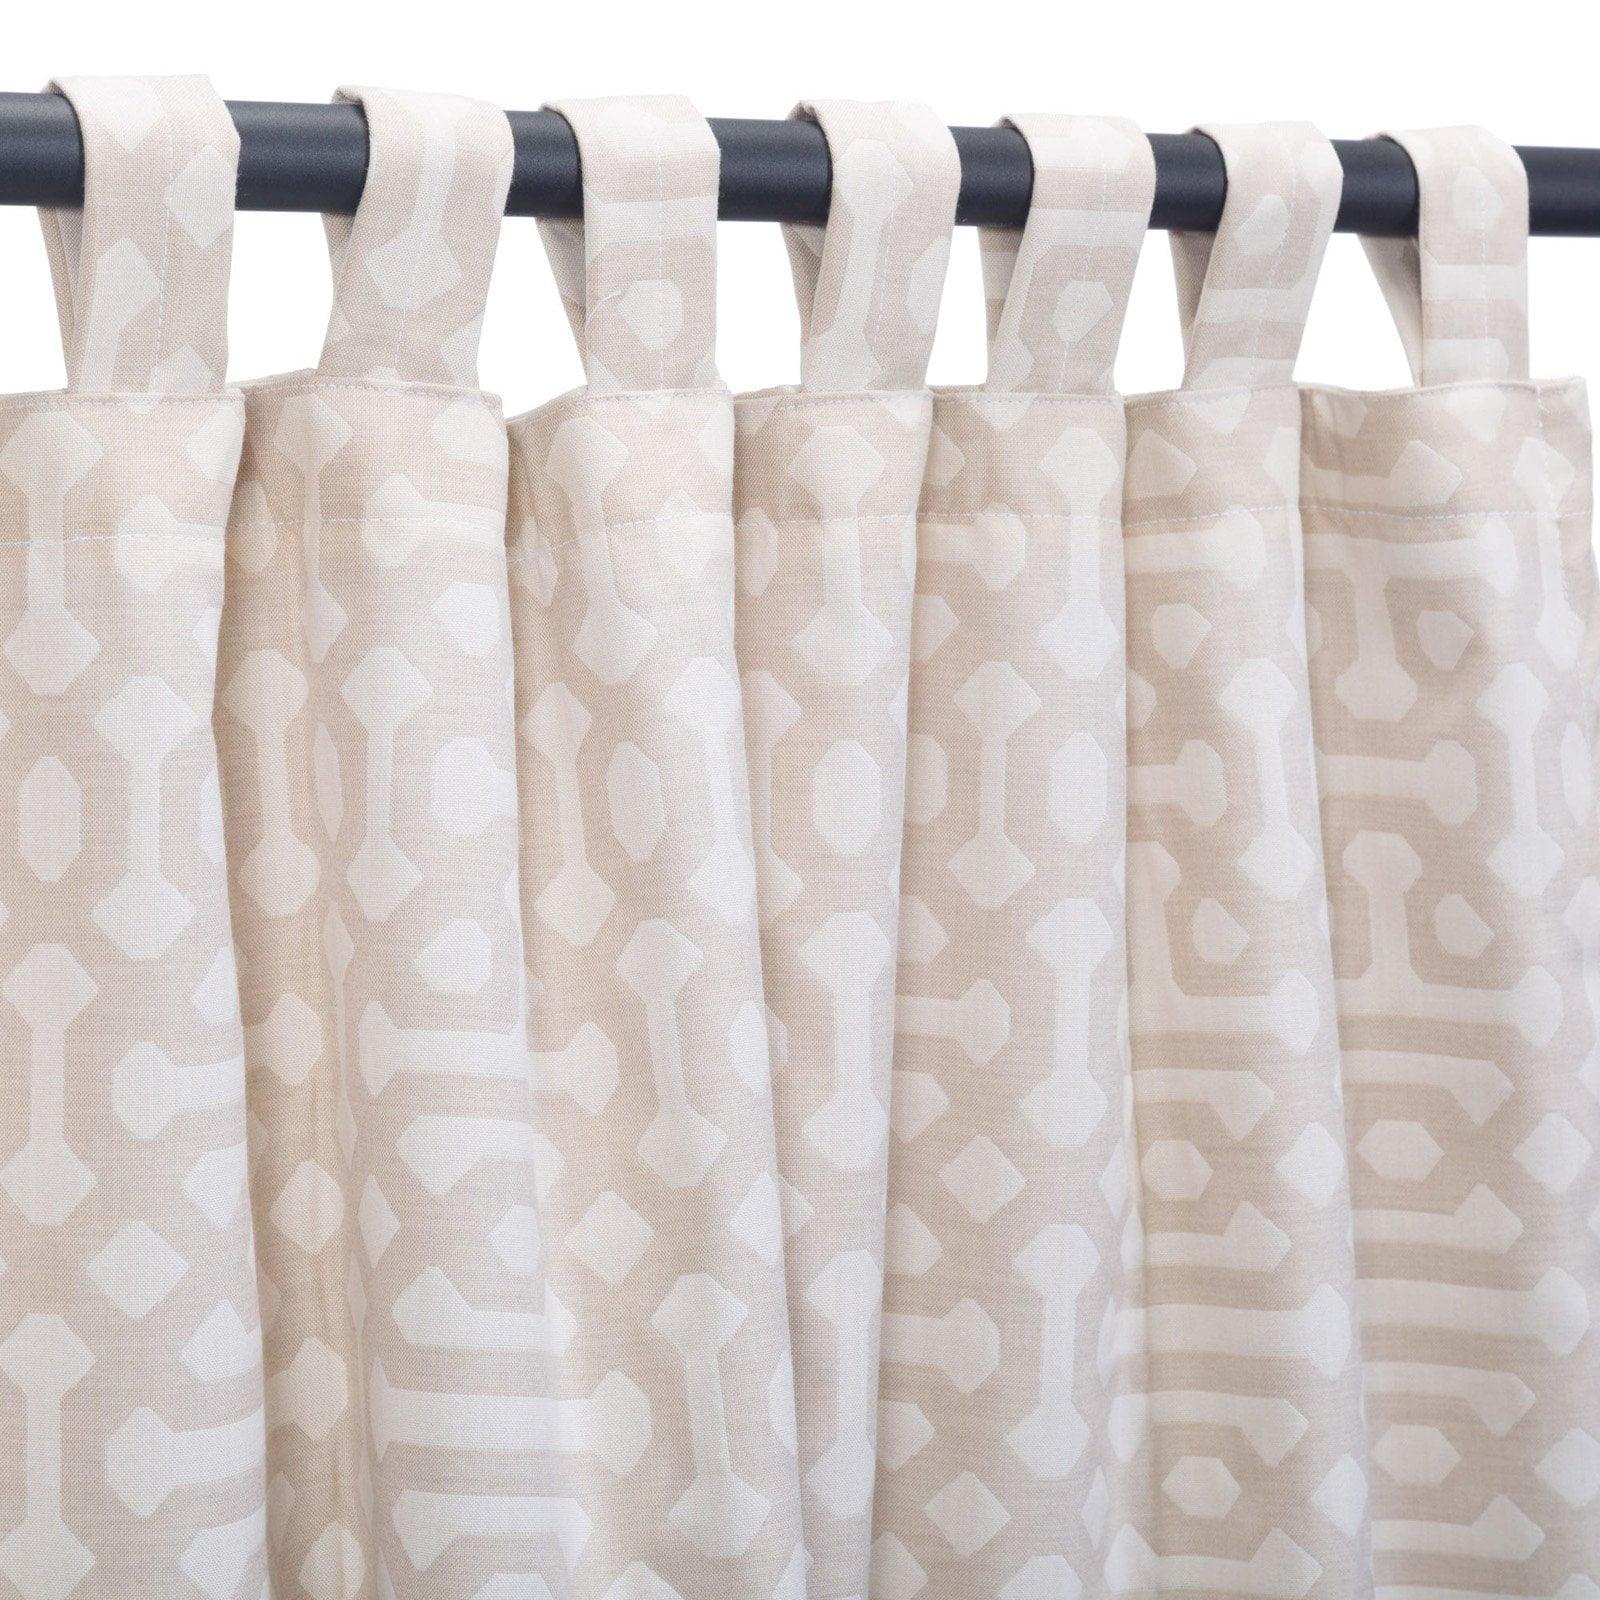 Pawleys Island Sunbrella Tab Top Deluxe Outdoor Curtain